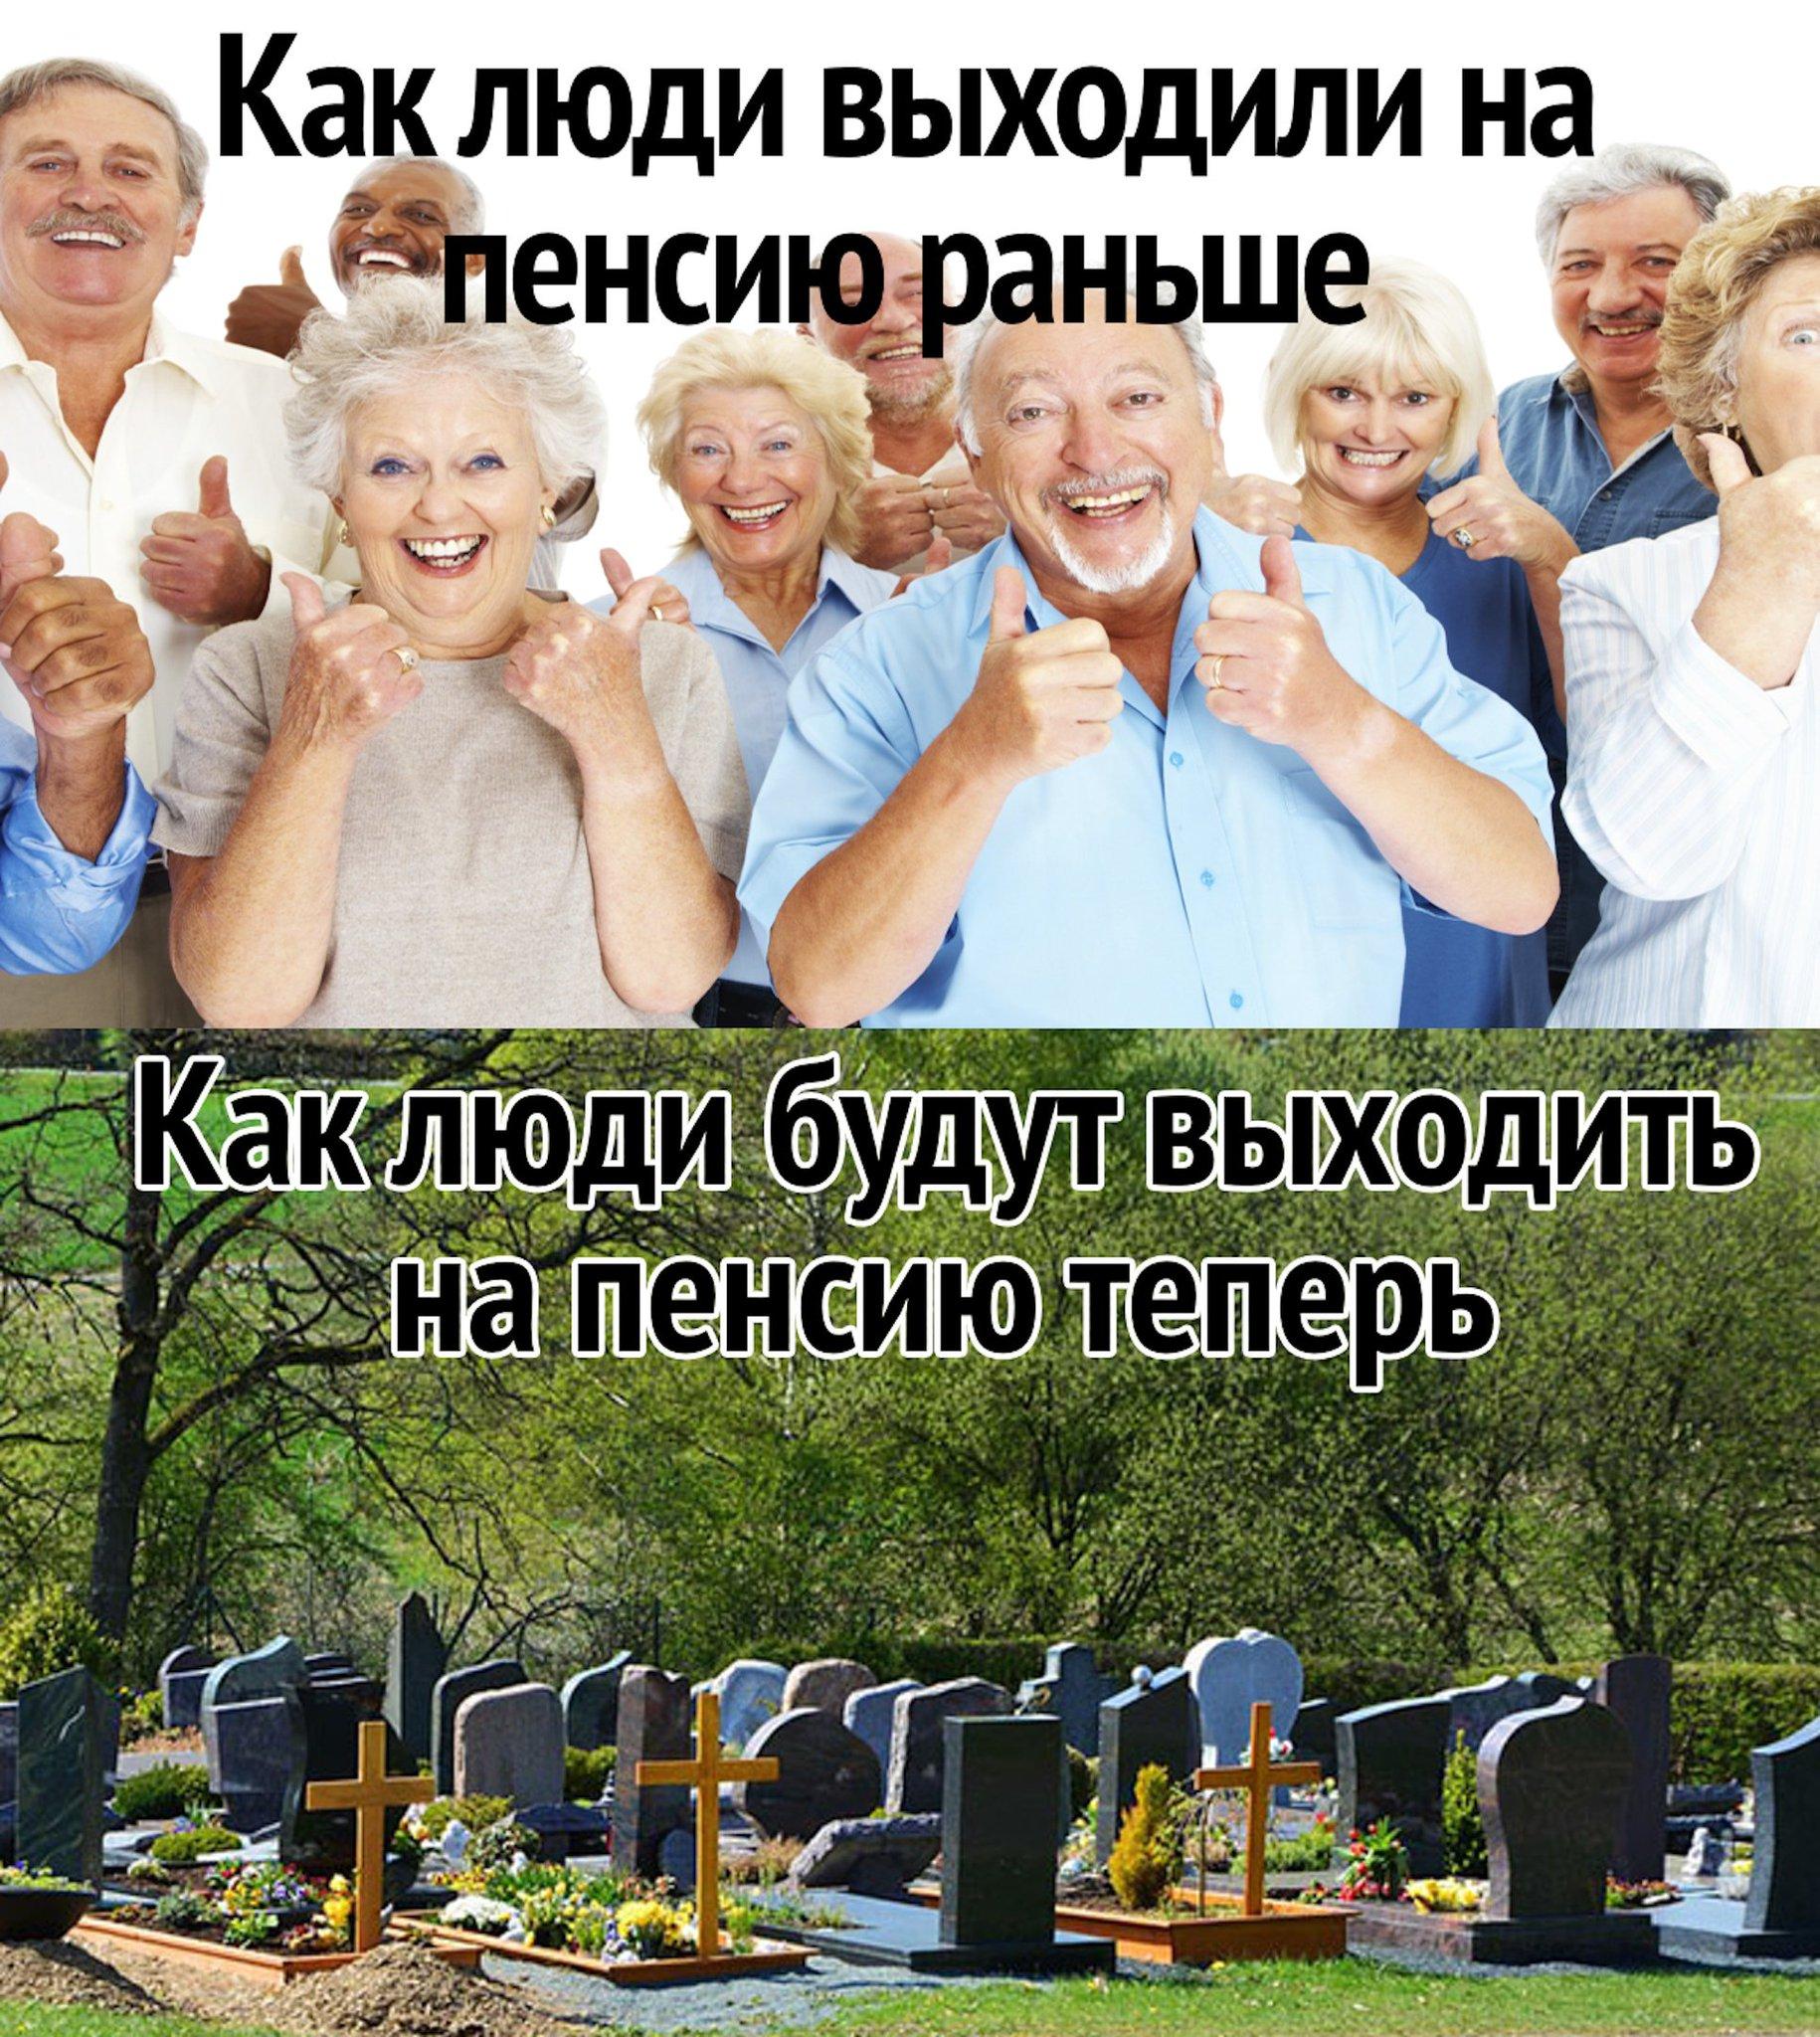 прикол клуб пенсионеров картинки летом